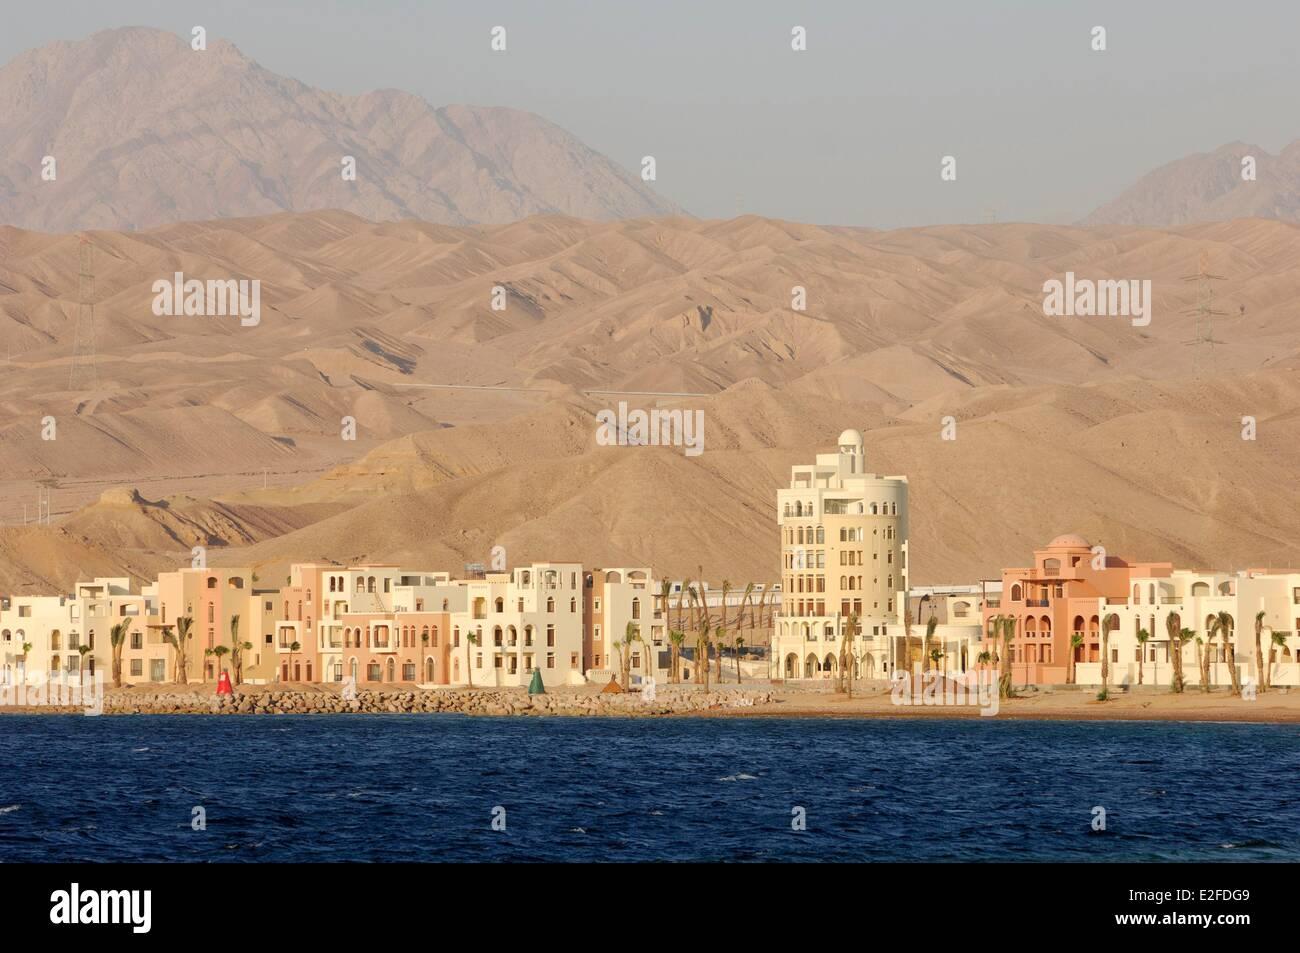 Jordan, Aqaba Governorate, Aqaba, marina Tala Bay south from Aqaba, buildings at the foot of sand dunes Stock Photo